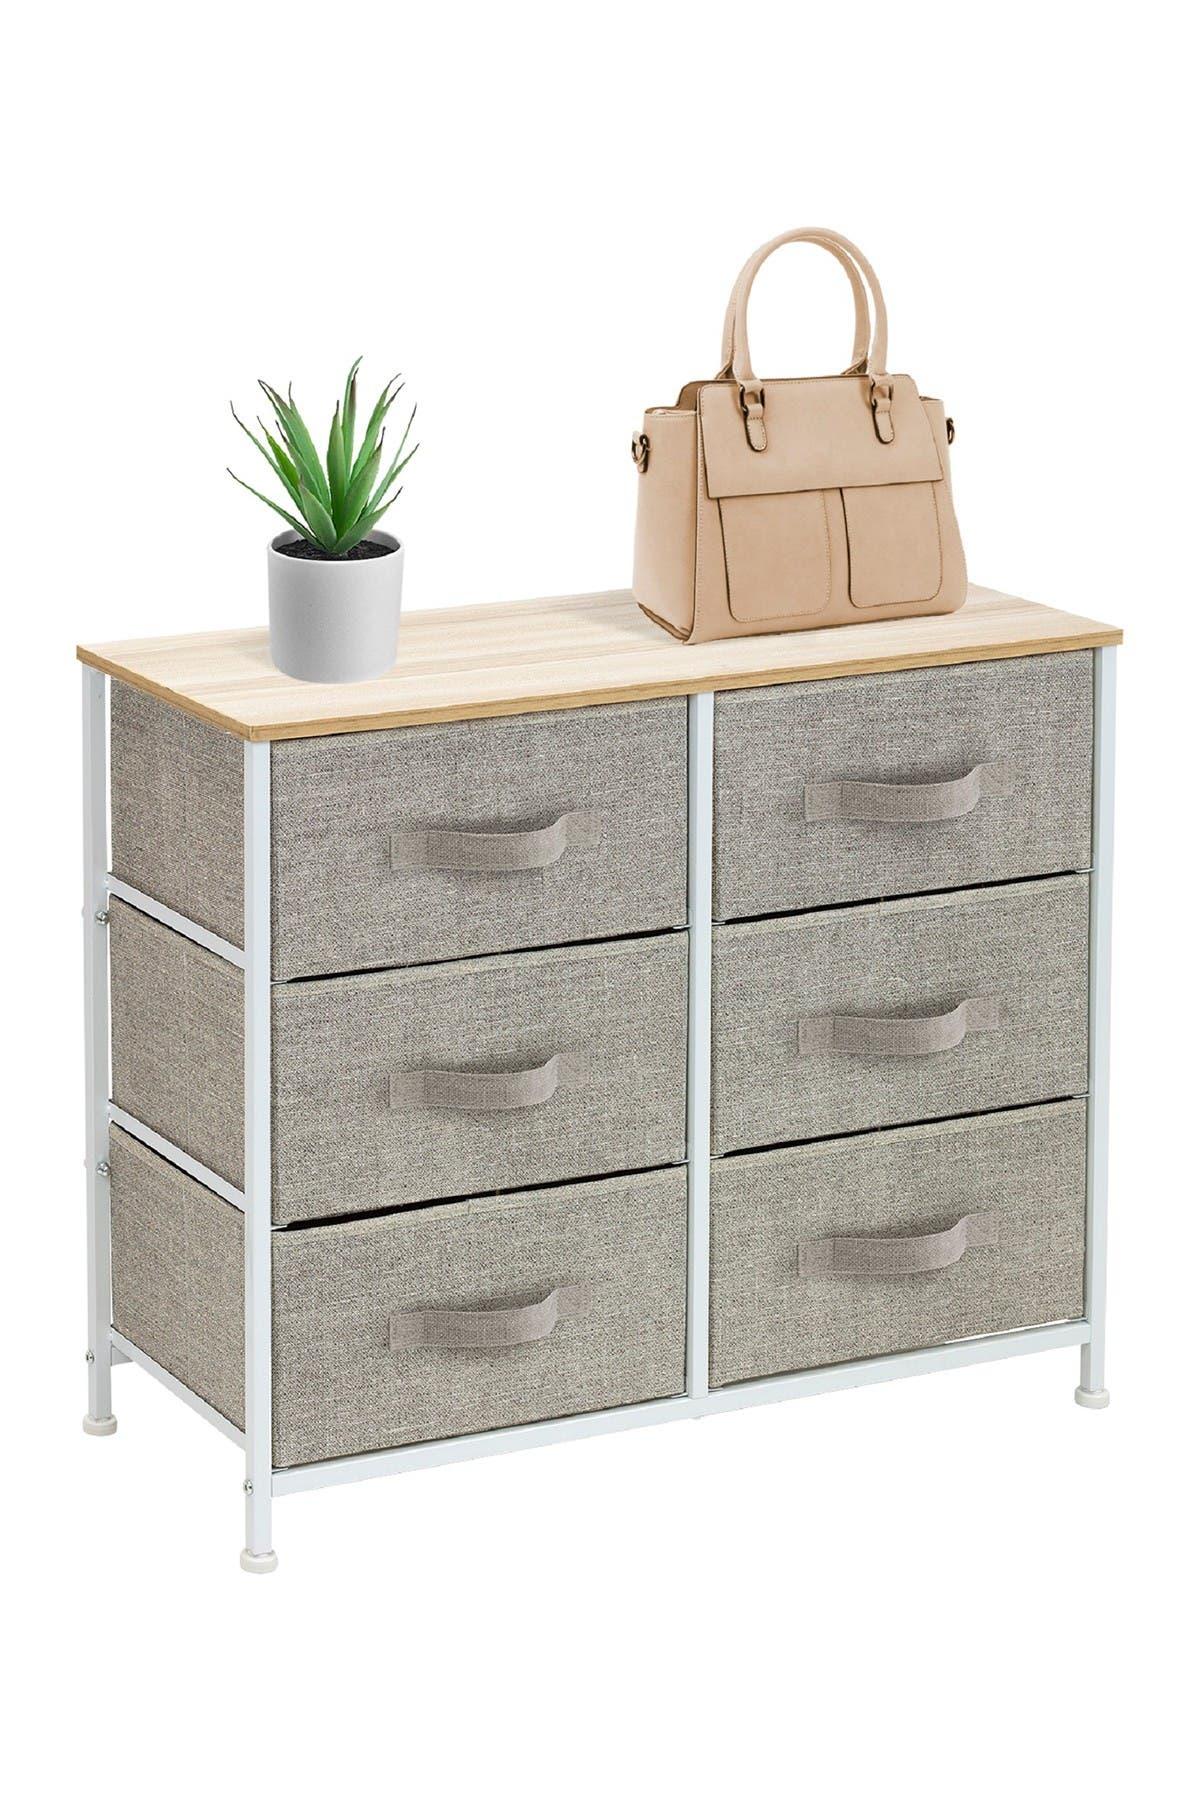 Image of Sorbus Beige Extra Wide 6-Drawer Organizer